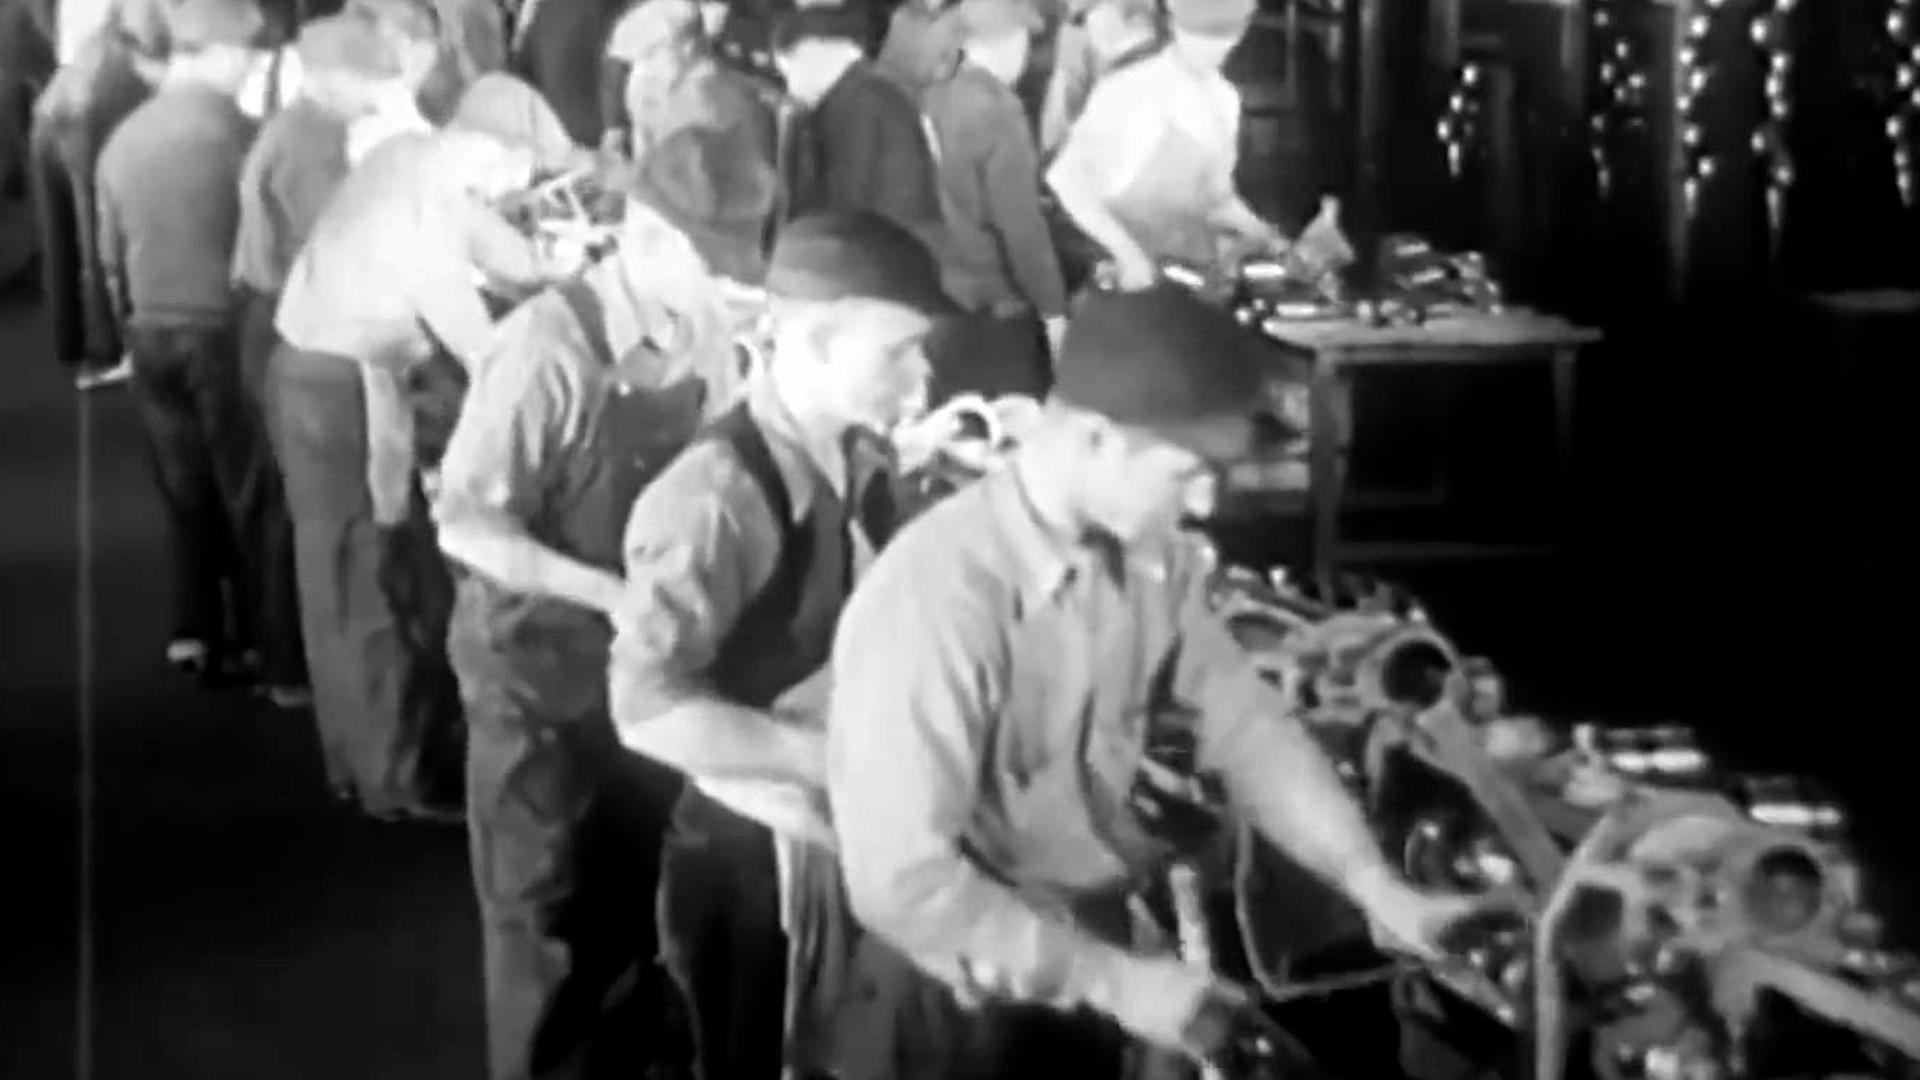 Working class men working in a factory